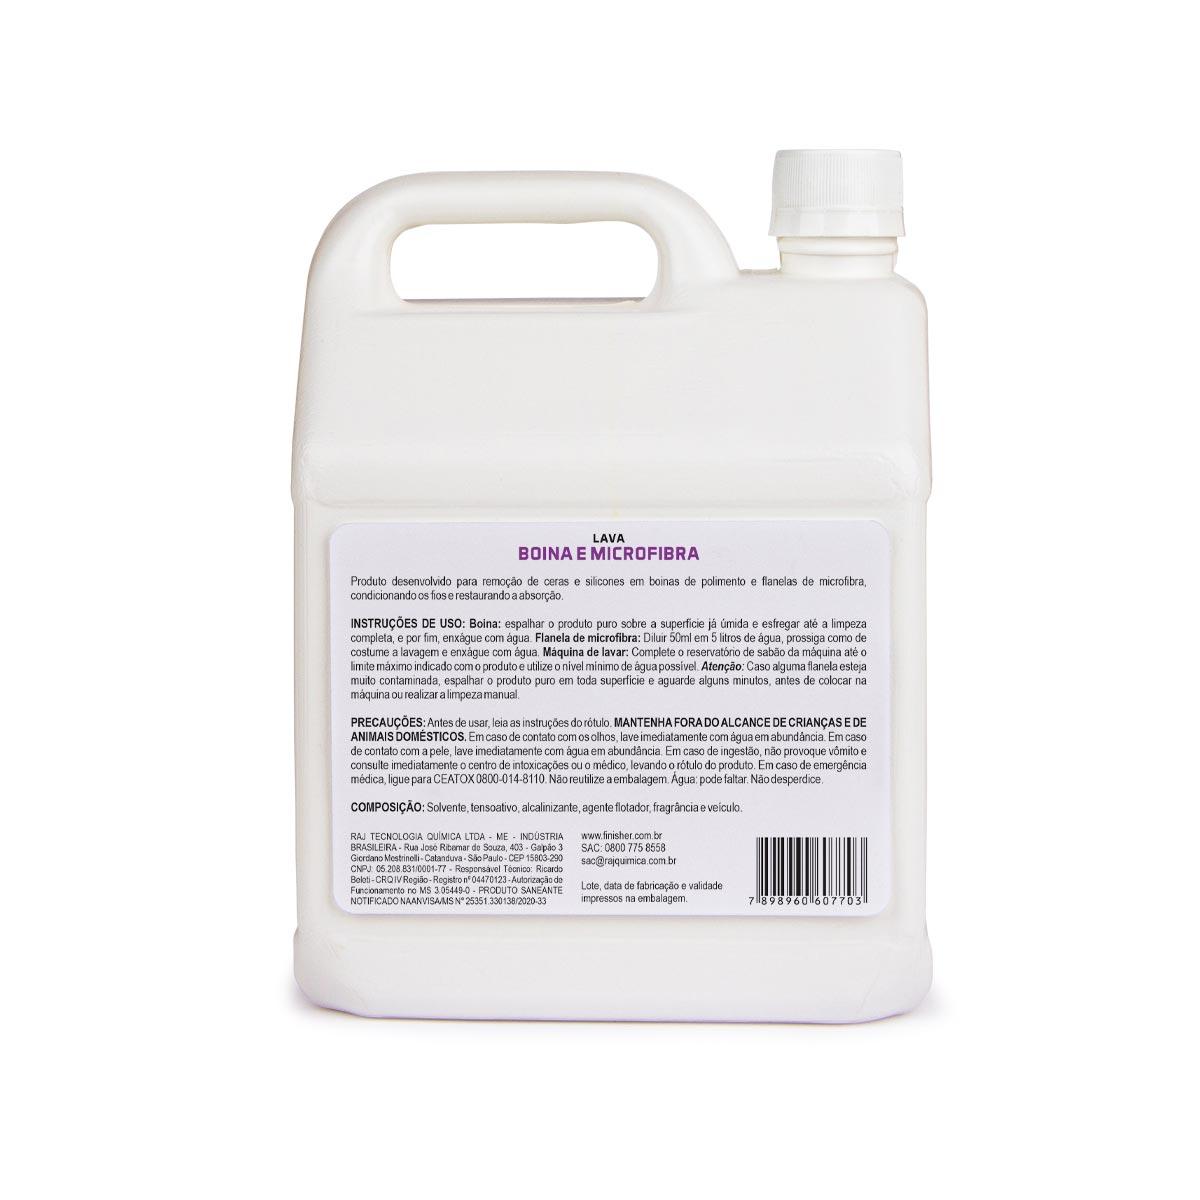 Lava Boinas e Microfibra Finisher 2,5 Litros